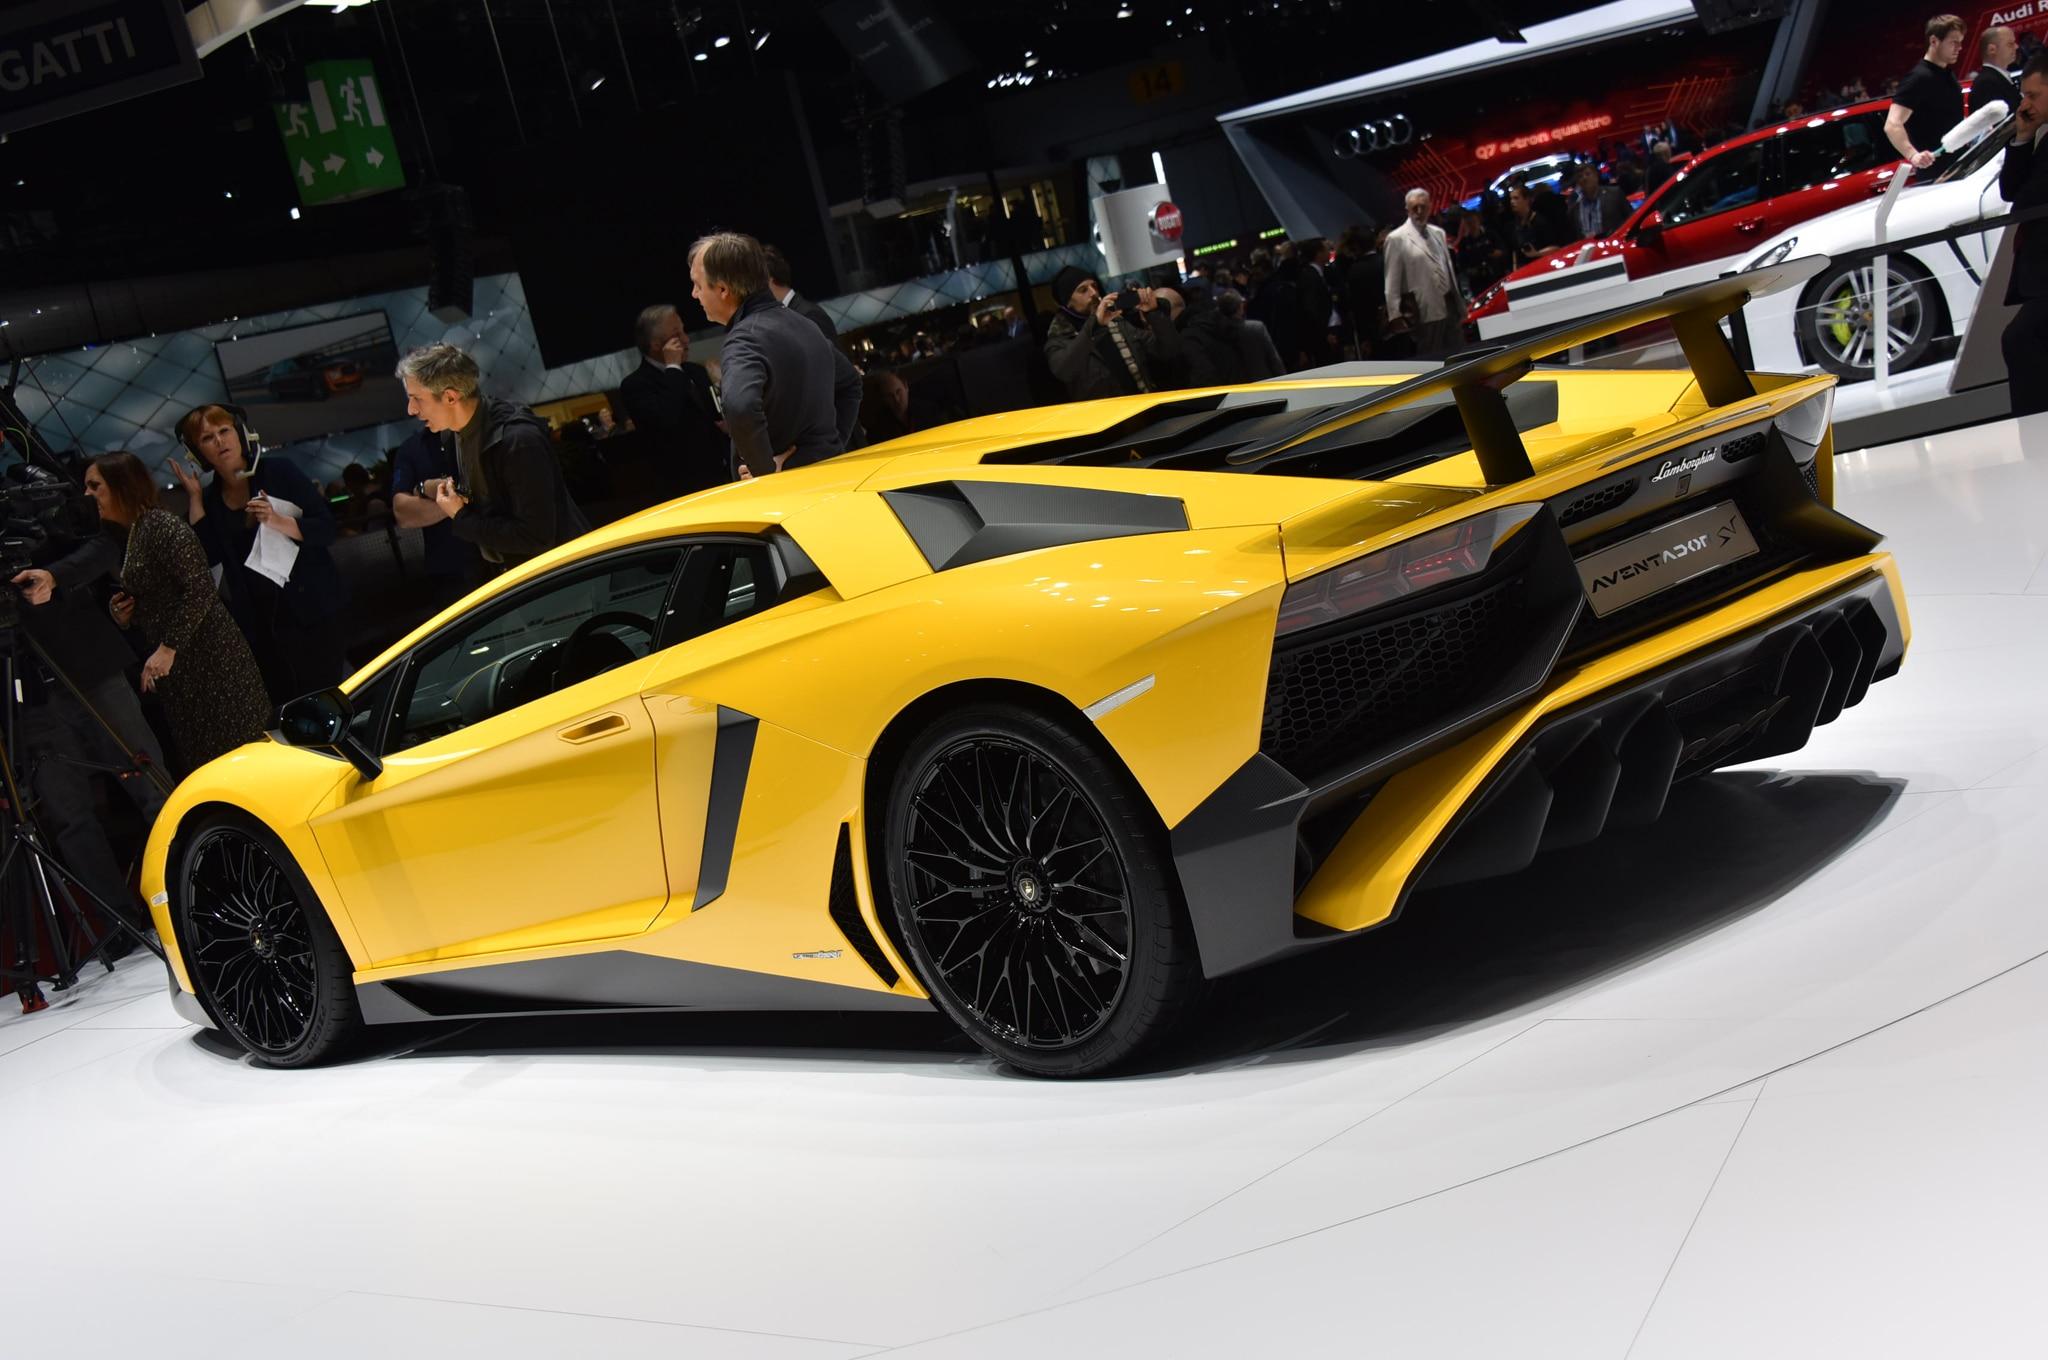 2016 Lamborghini Aventador Lp750 4 Sv Starts At 493 095 In The U S